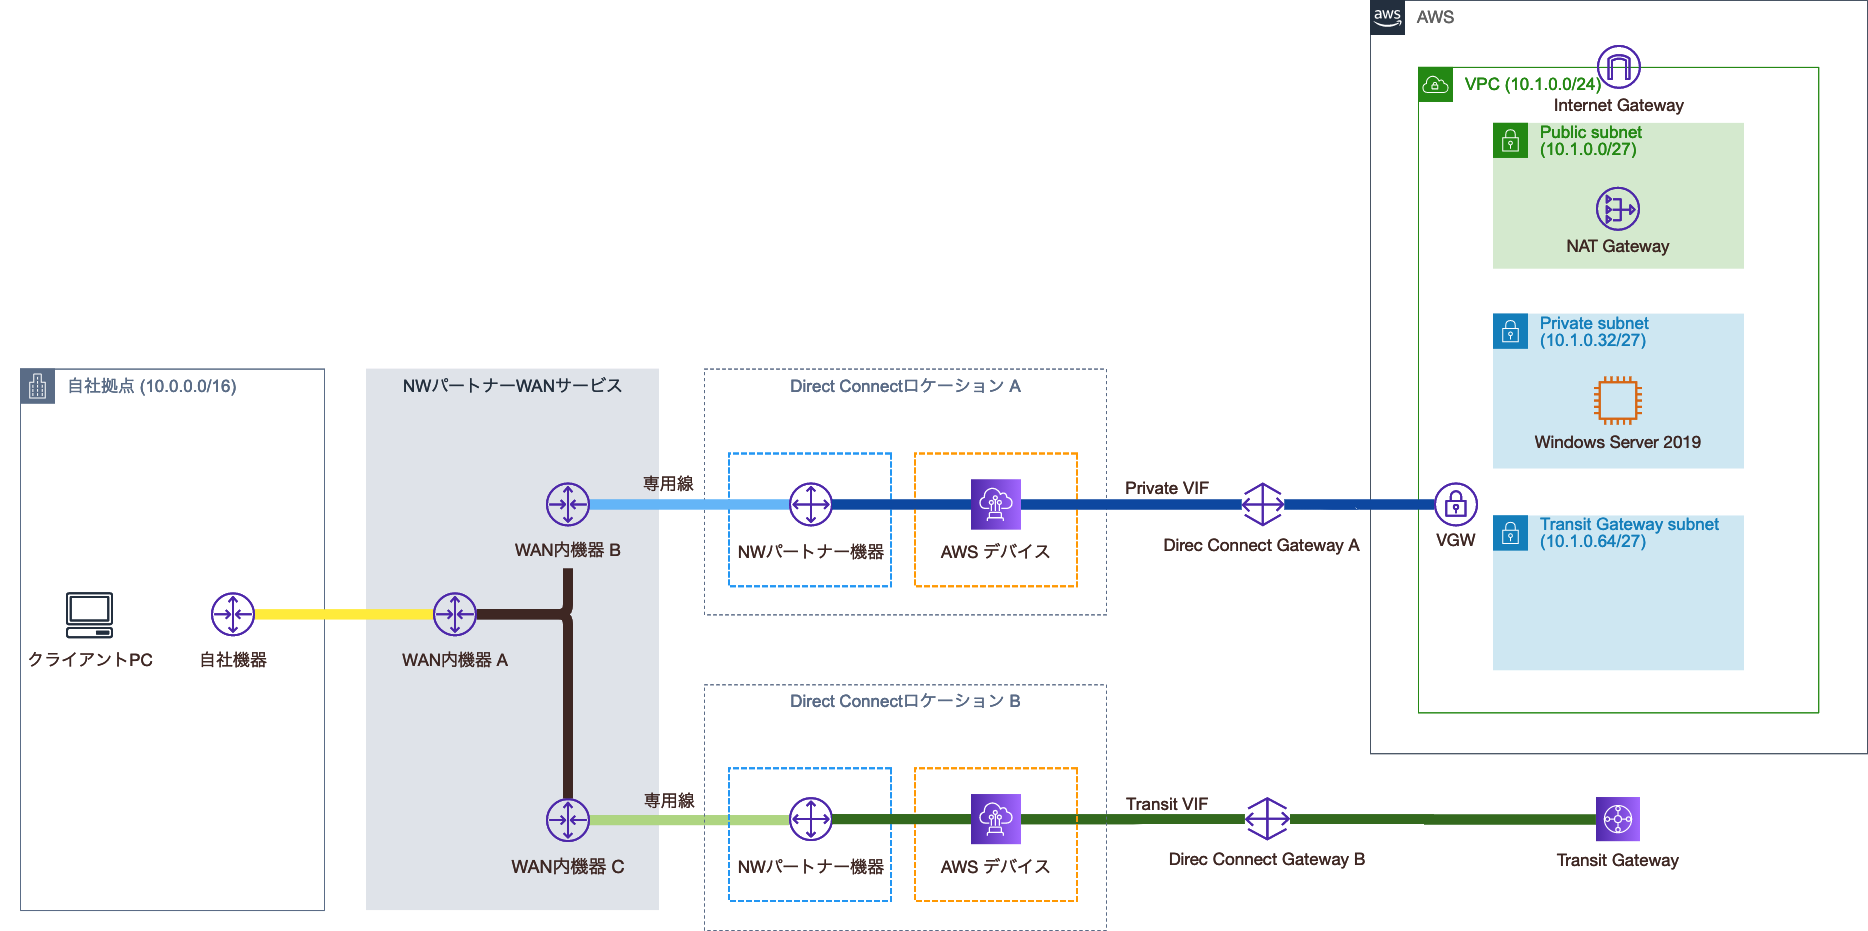 Transit Gateway Attachment用のサブネット追加後の構成図